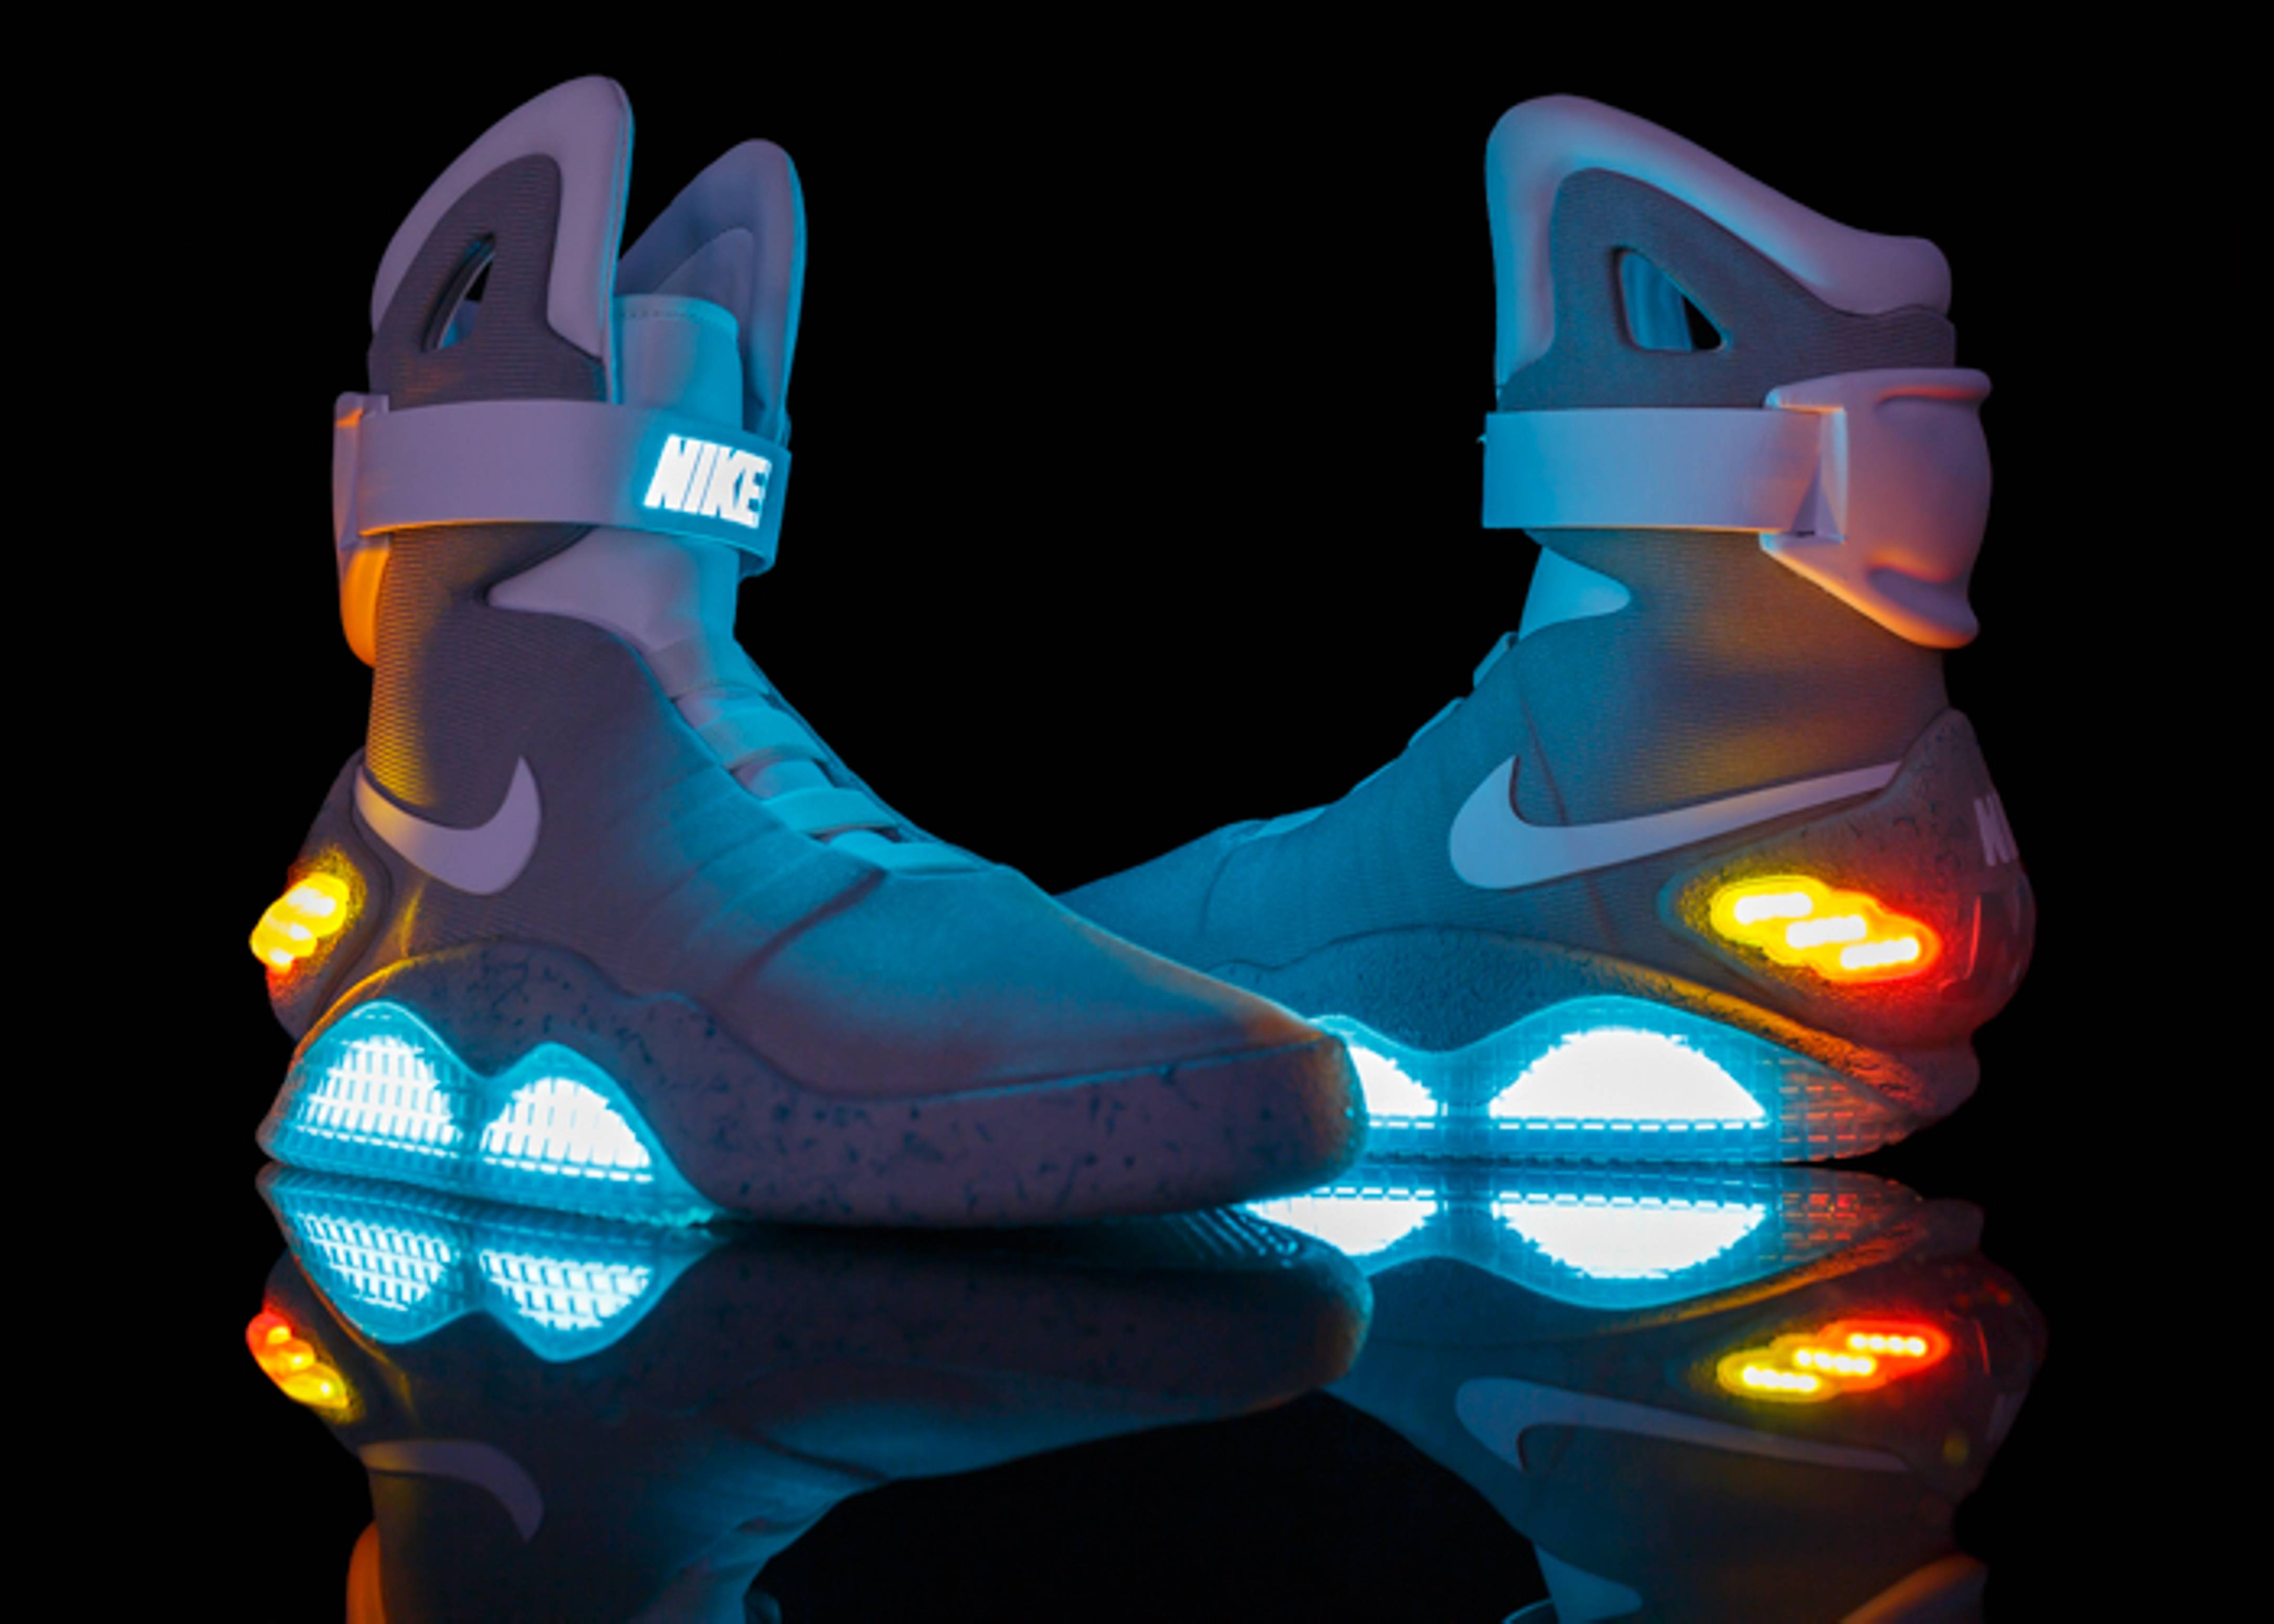 Ficticio gemelo Indirecto  Nike Mag 'Back To The Future' - Nike - 417744 001 - jetstream/white-pl blue    Flight Club